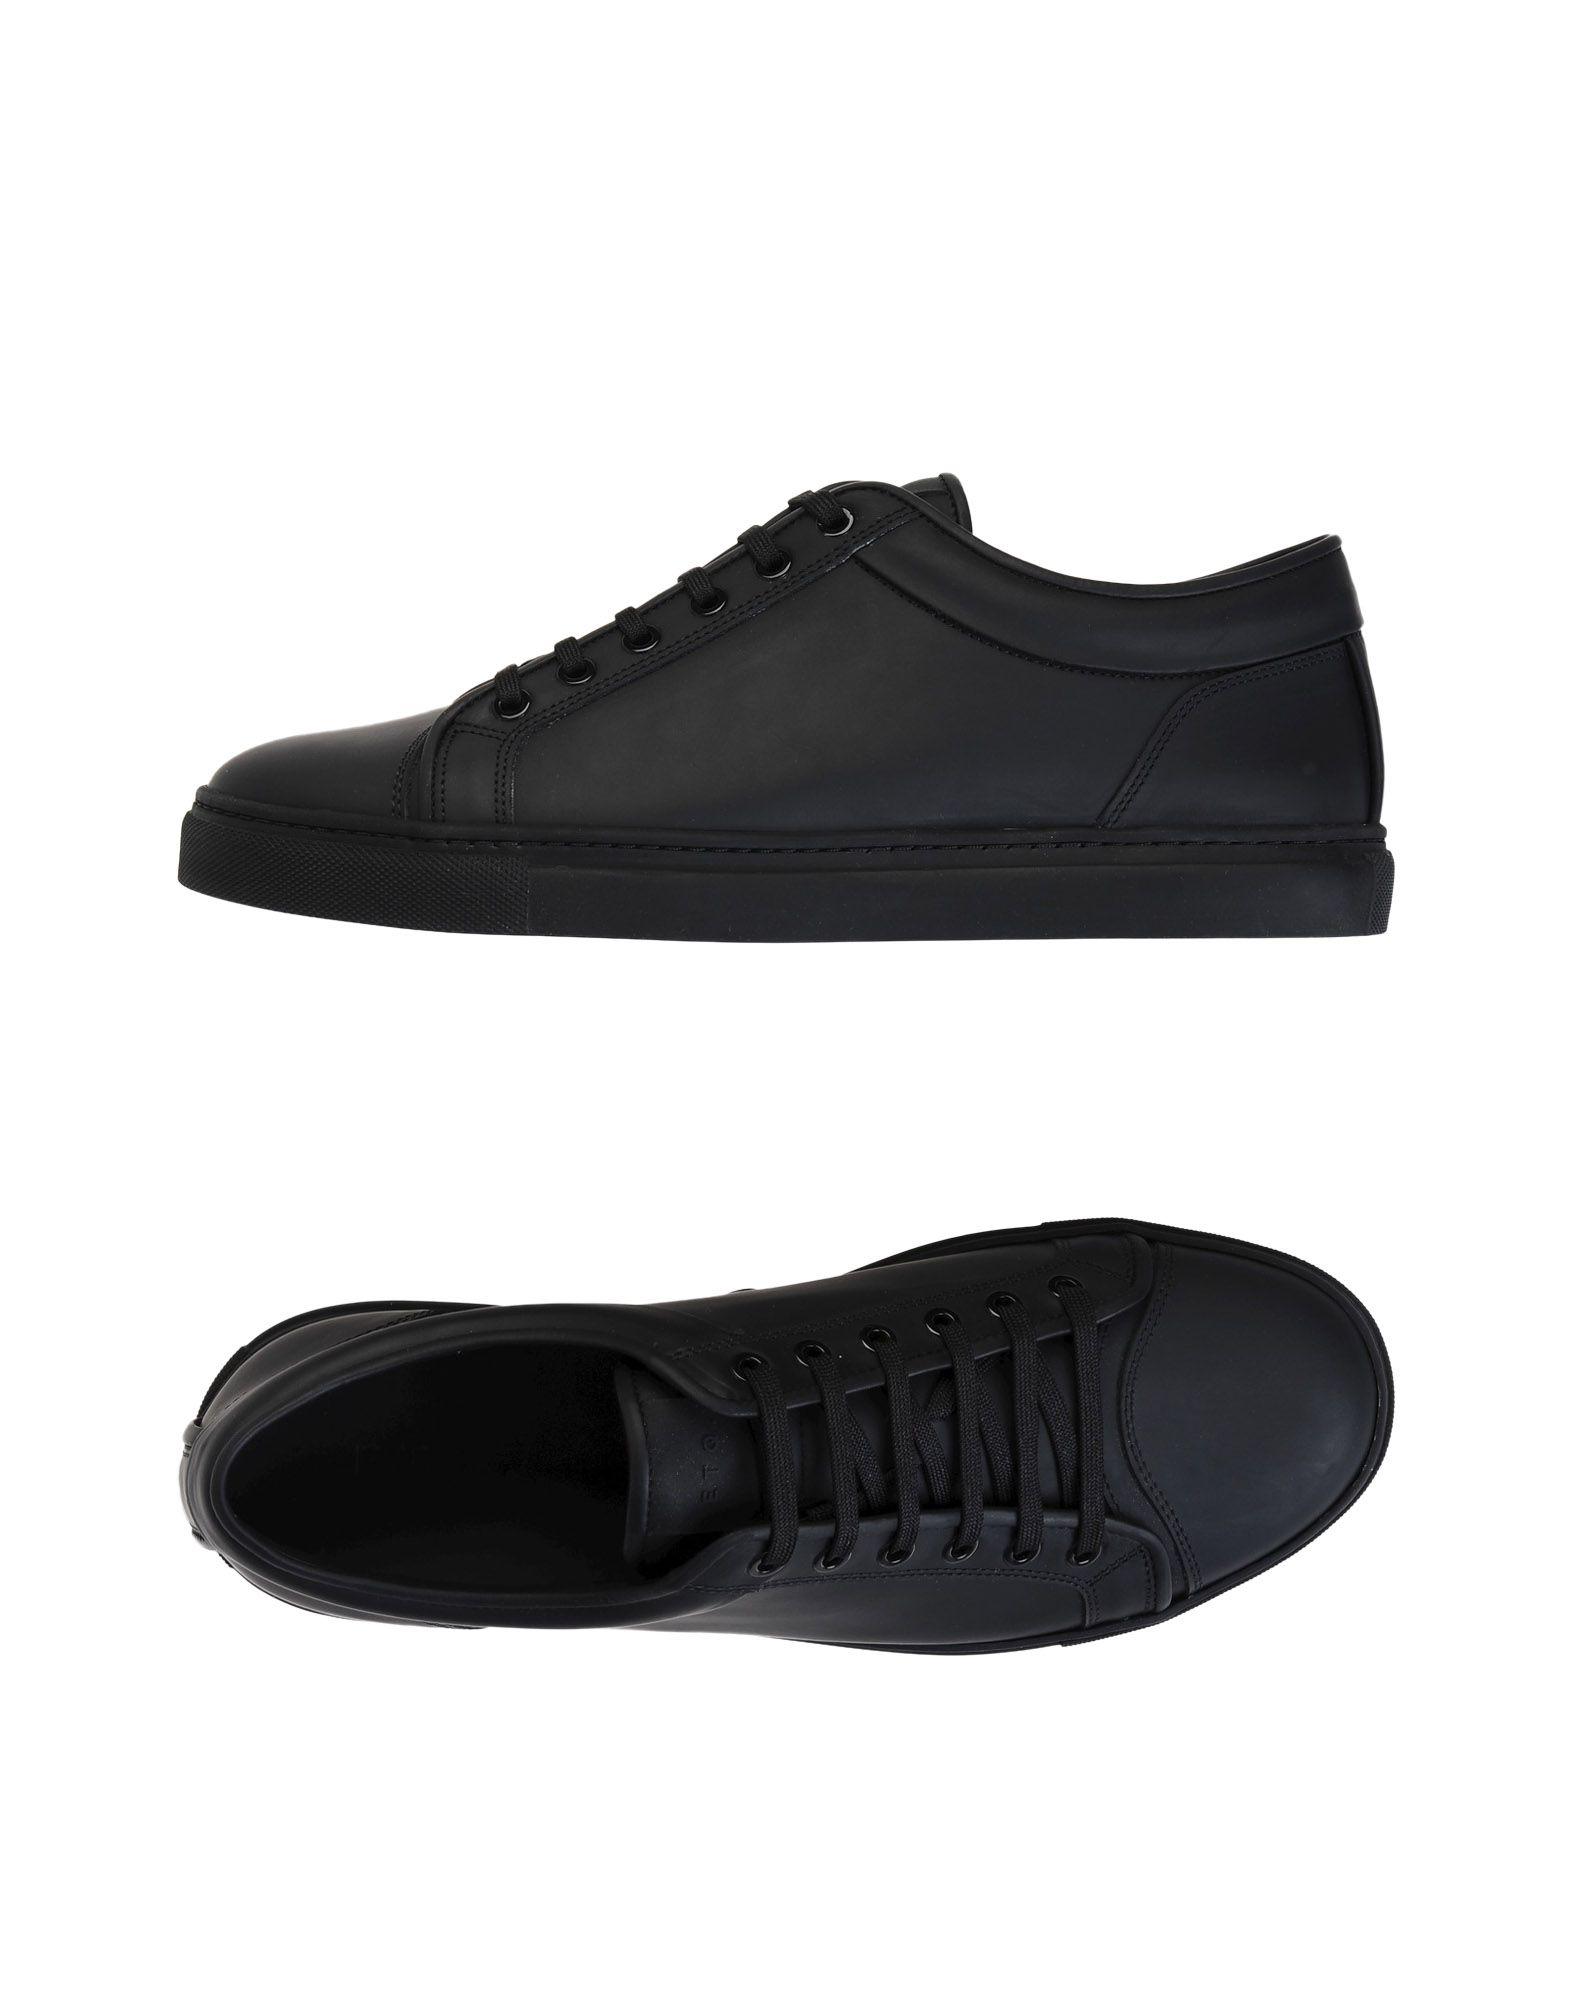 Etq 11449473FC Amsterdam Flat Black  11449473FC Etq Gute Qualität beliebte Schuhe 2b5dc5